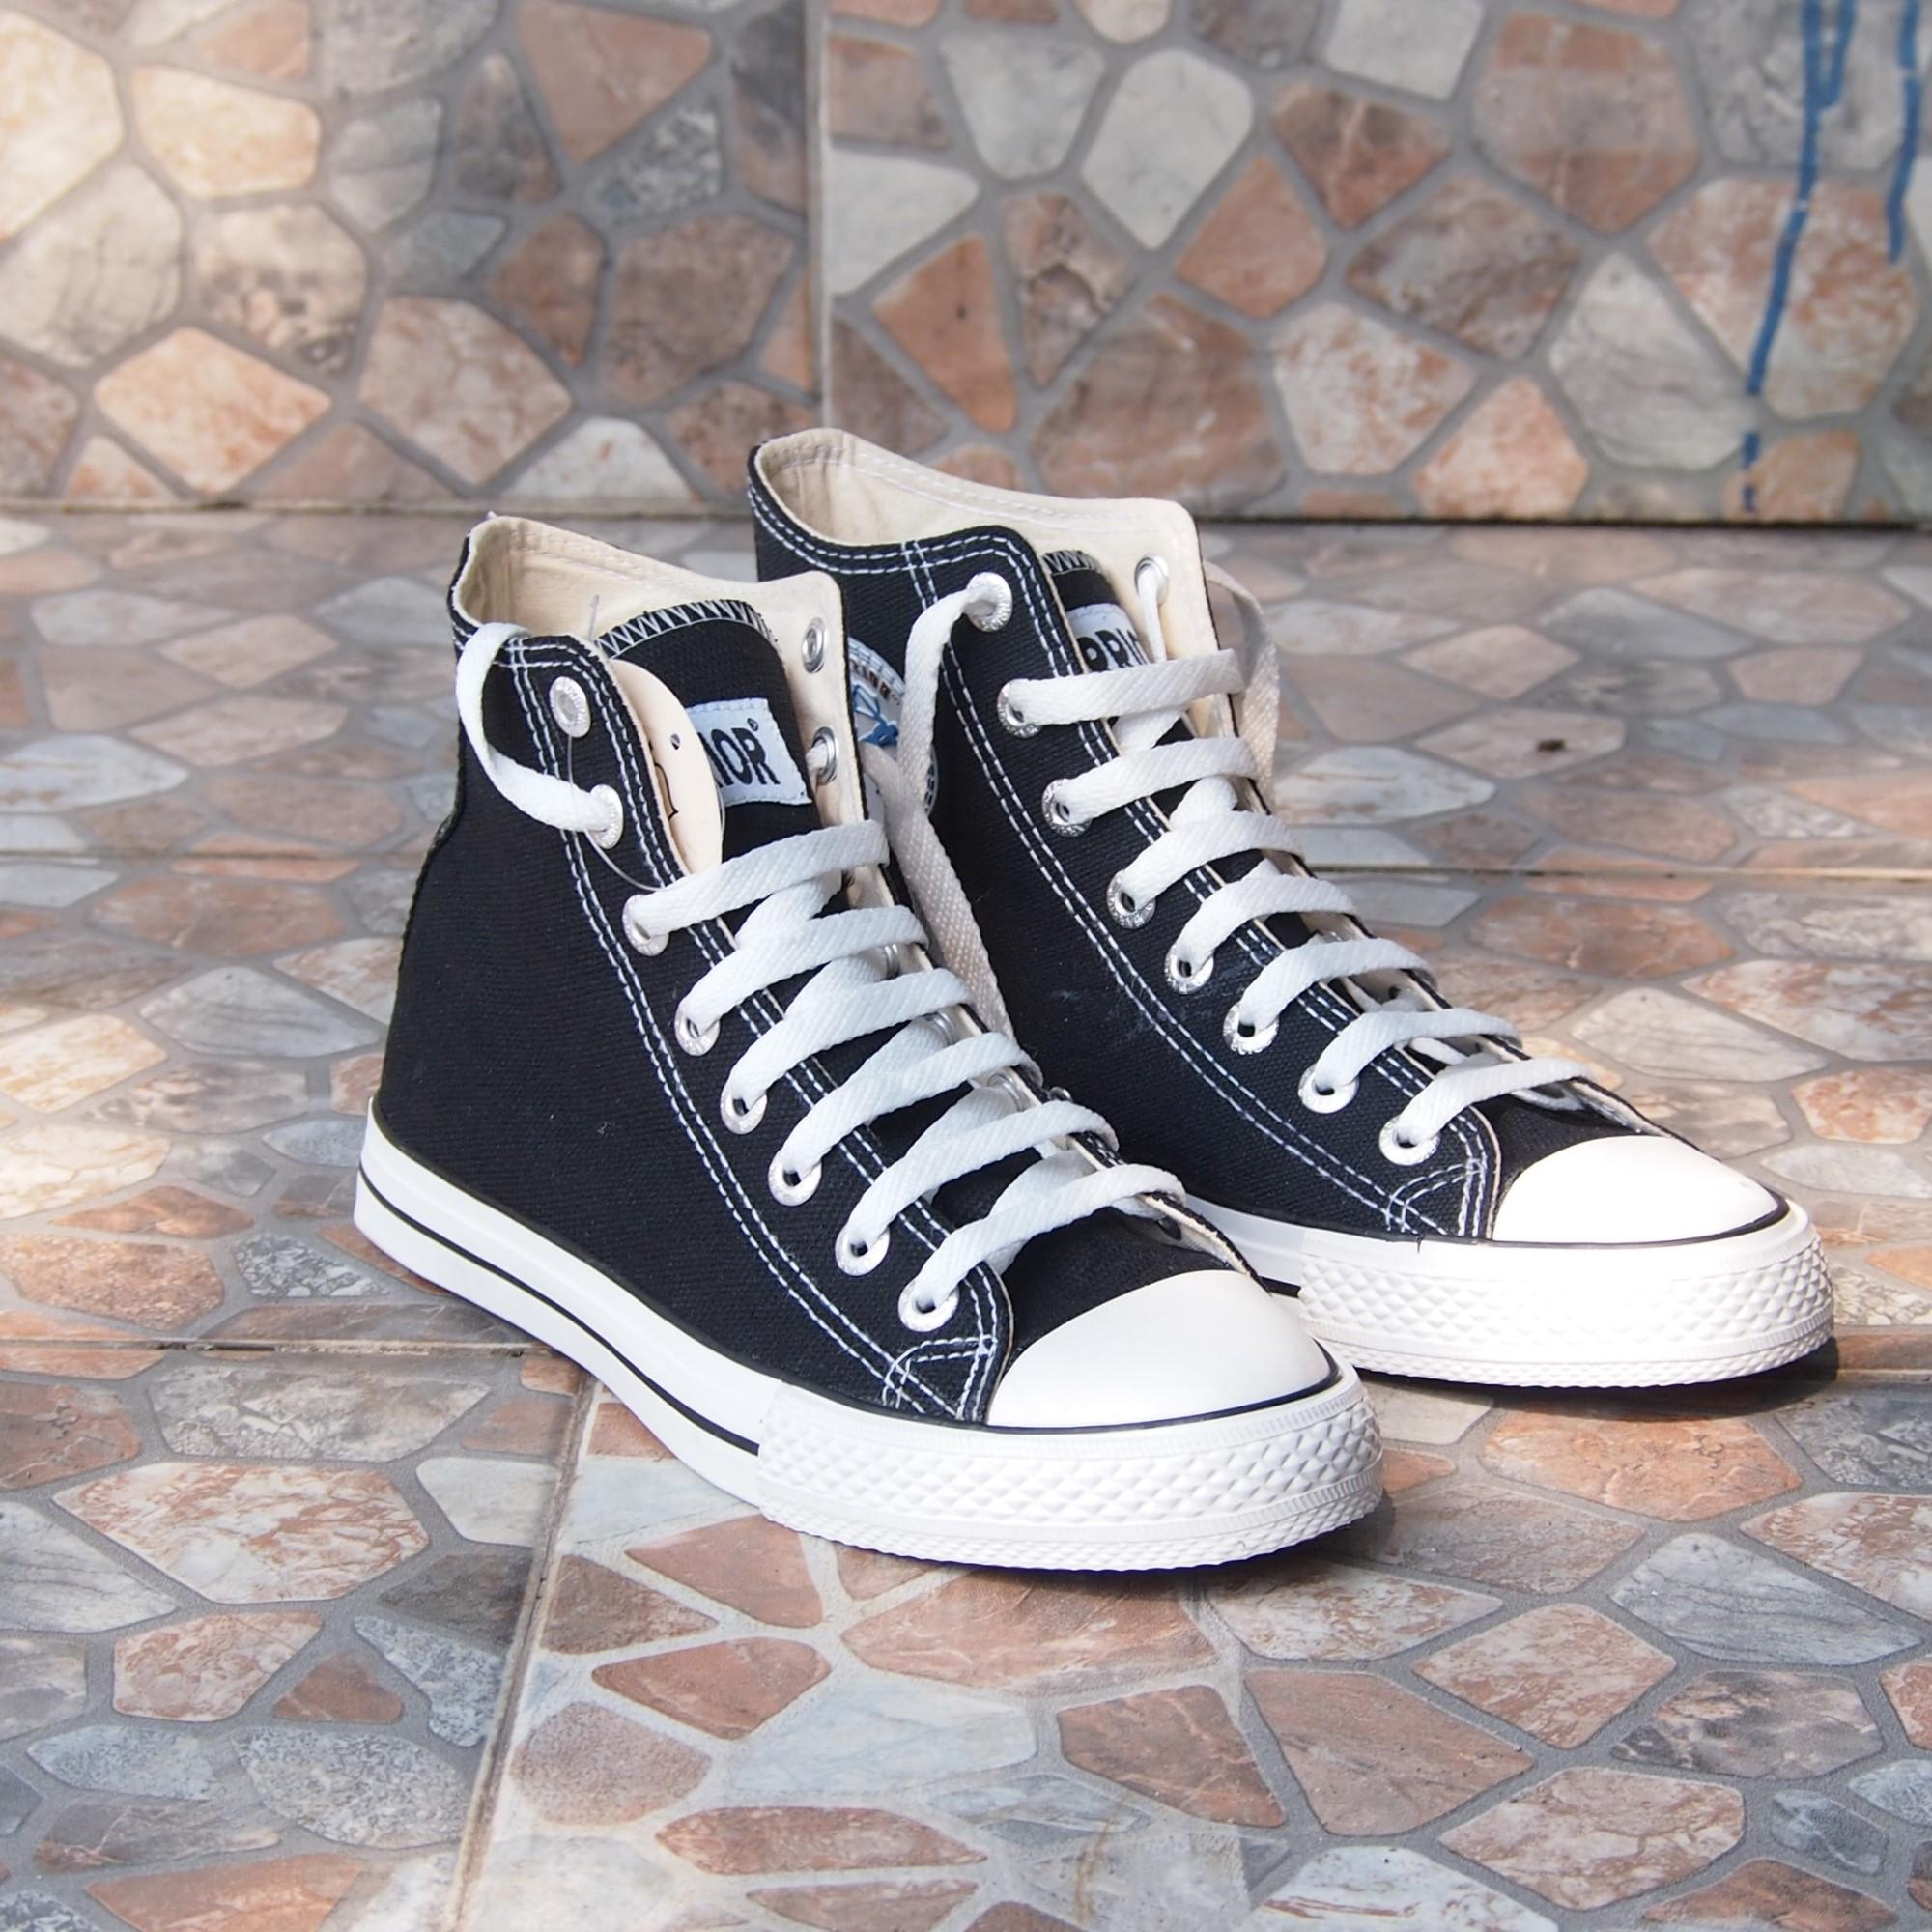 Sepatu Kets Sepatu Sekolah Cewek Cowok Warrior High SPARTAHC Black